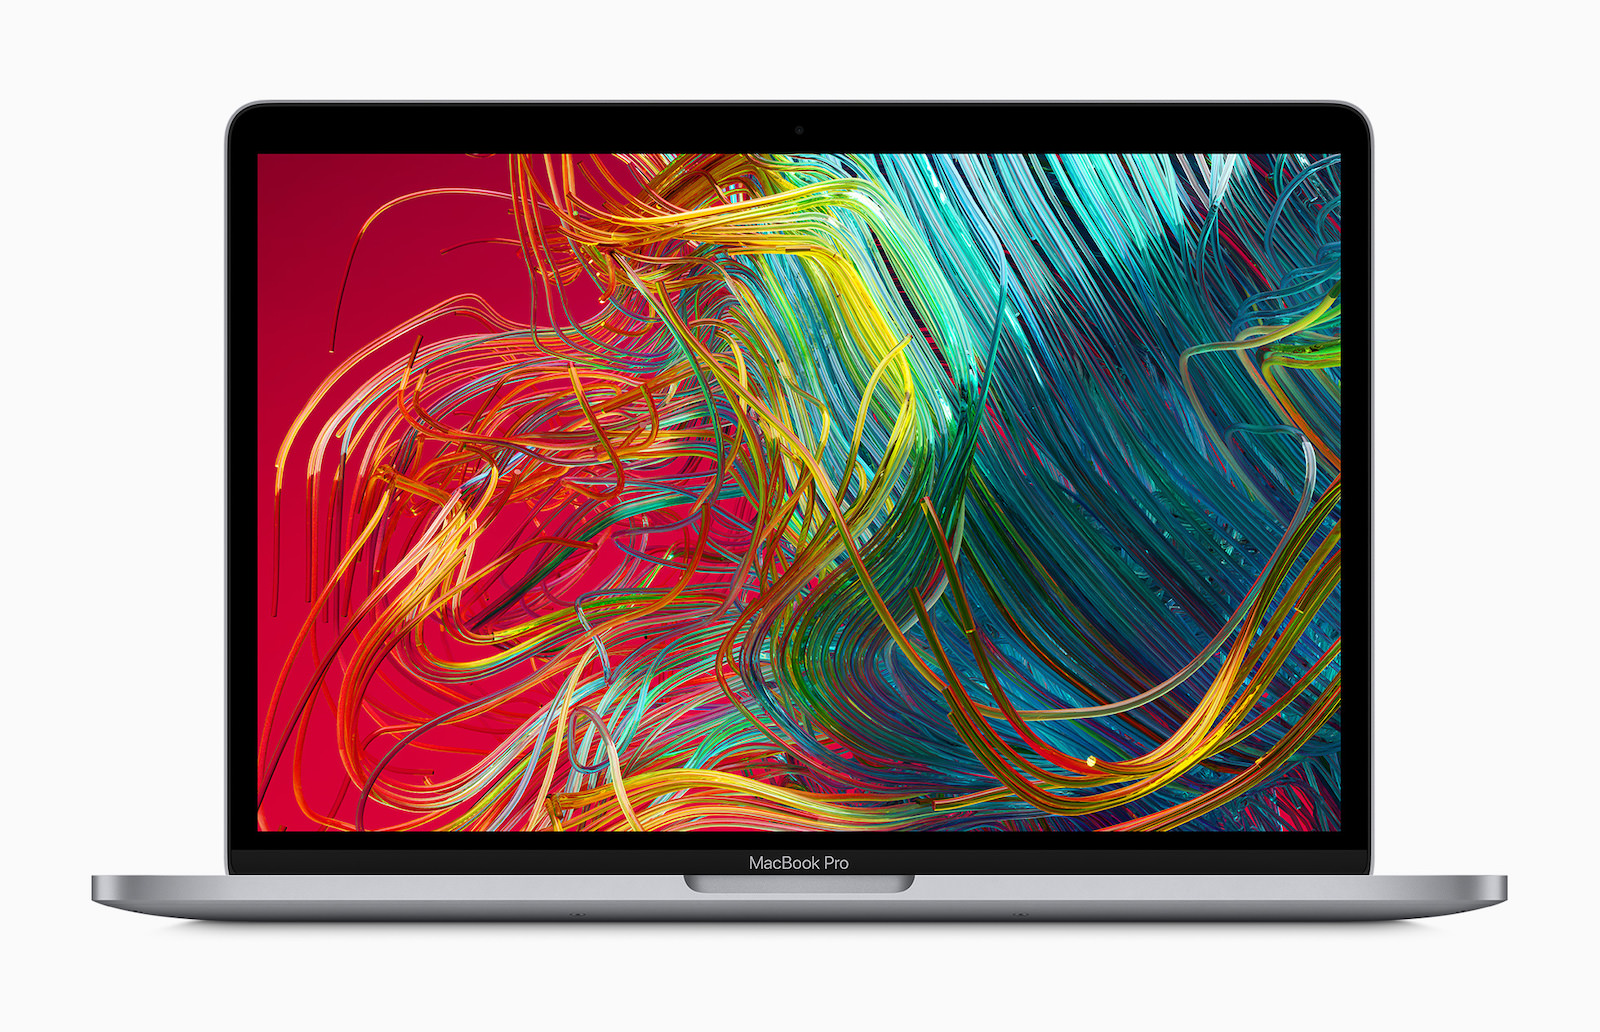 Apple macbook pro 13 inch with retina display screen 05042020